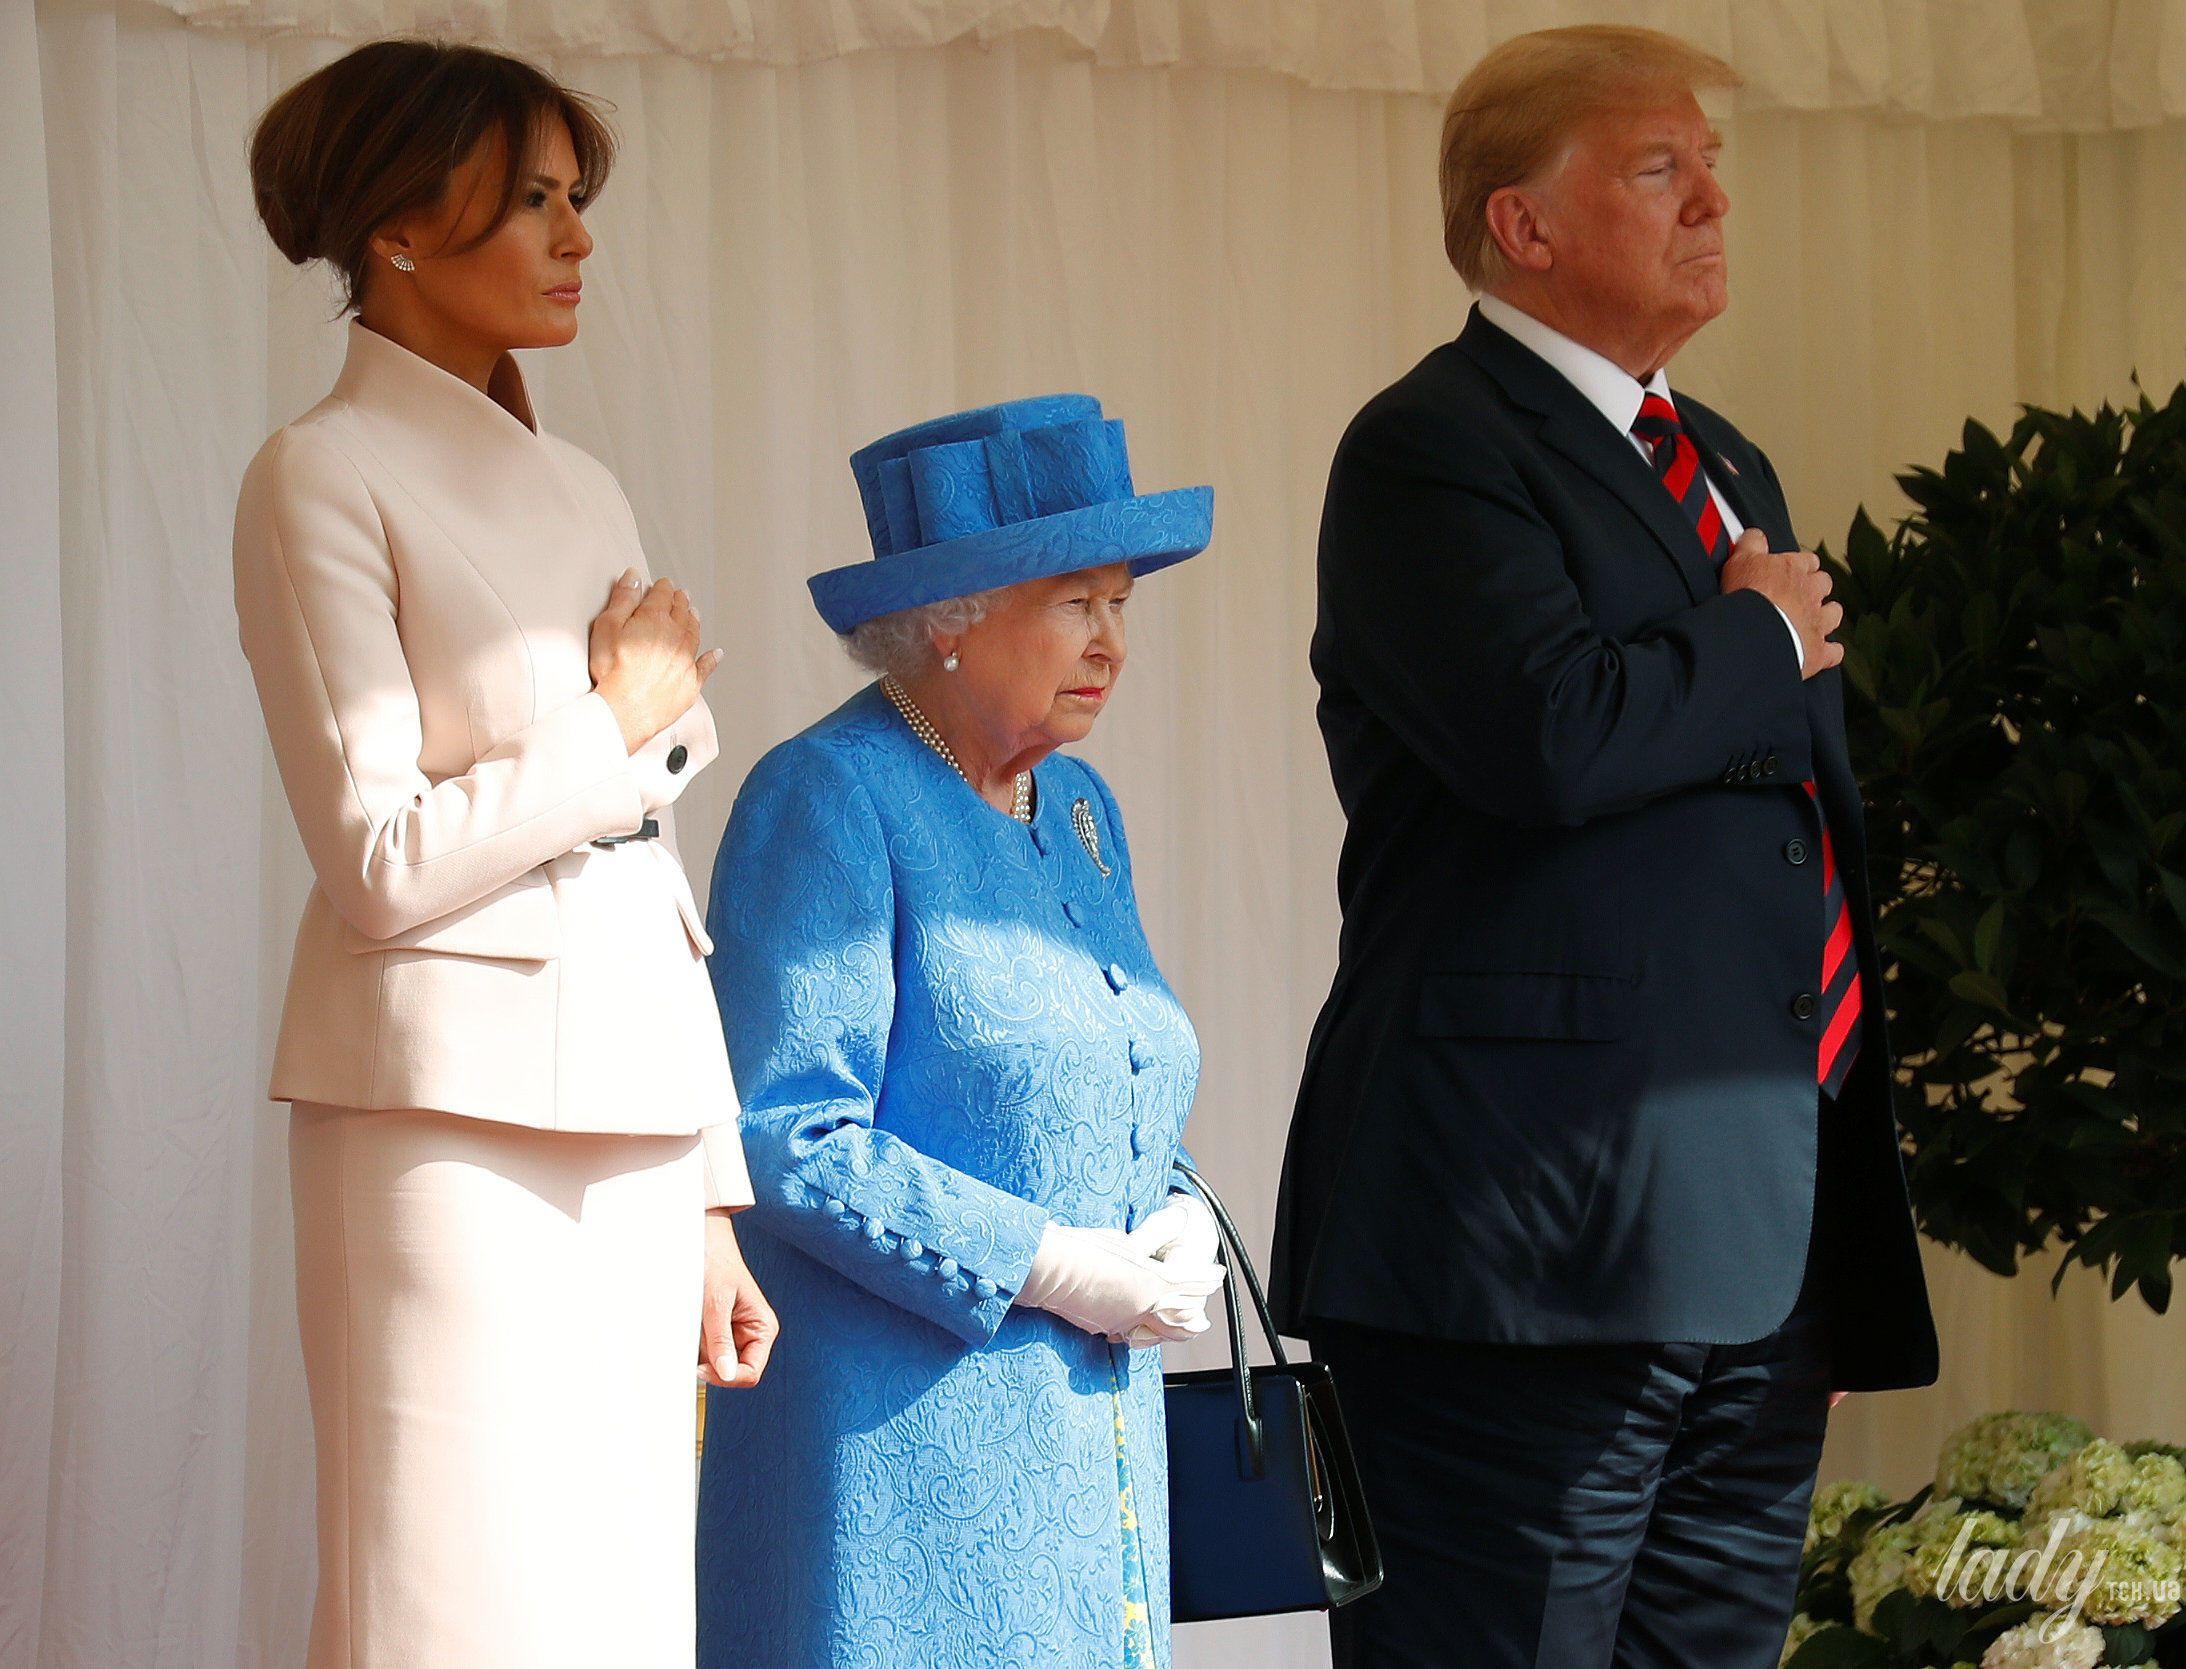 Королева Елизавета II, Мелания Трамп и Дональд Трамп_1